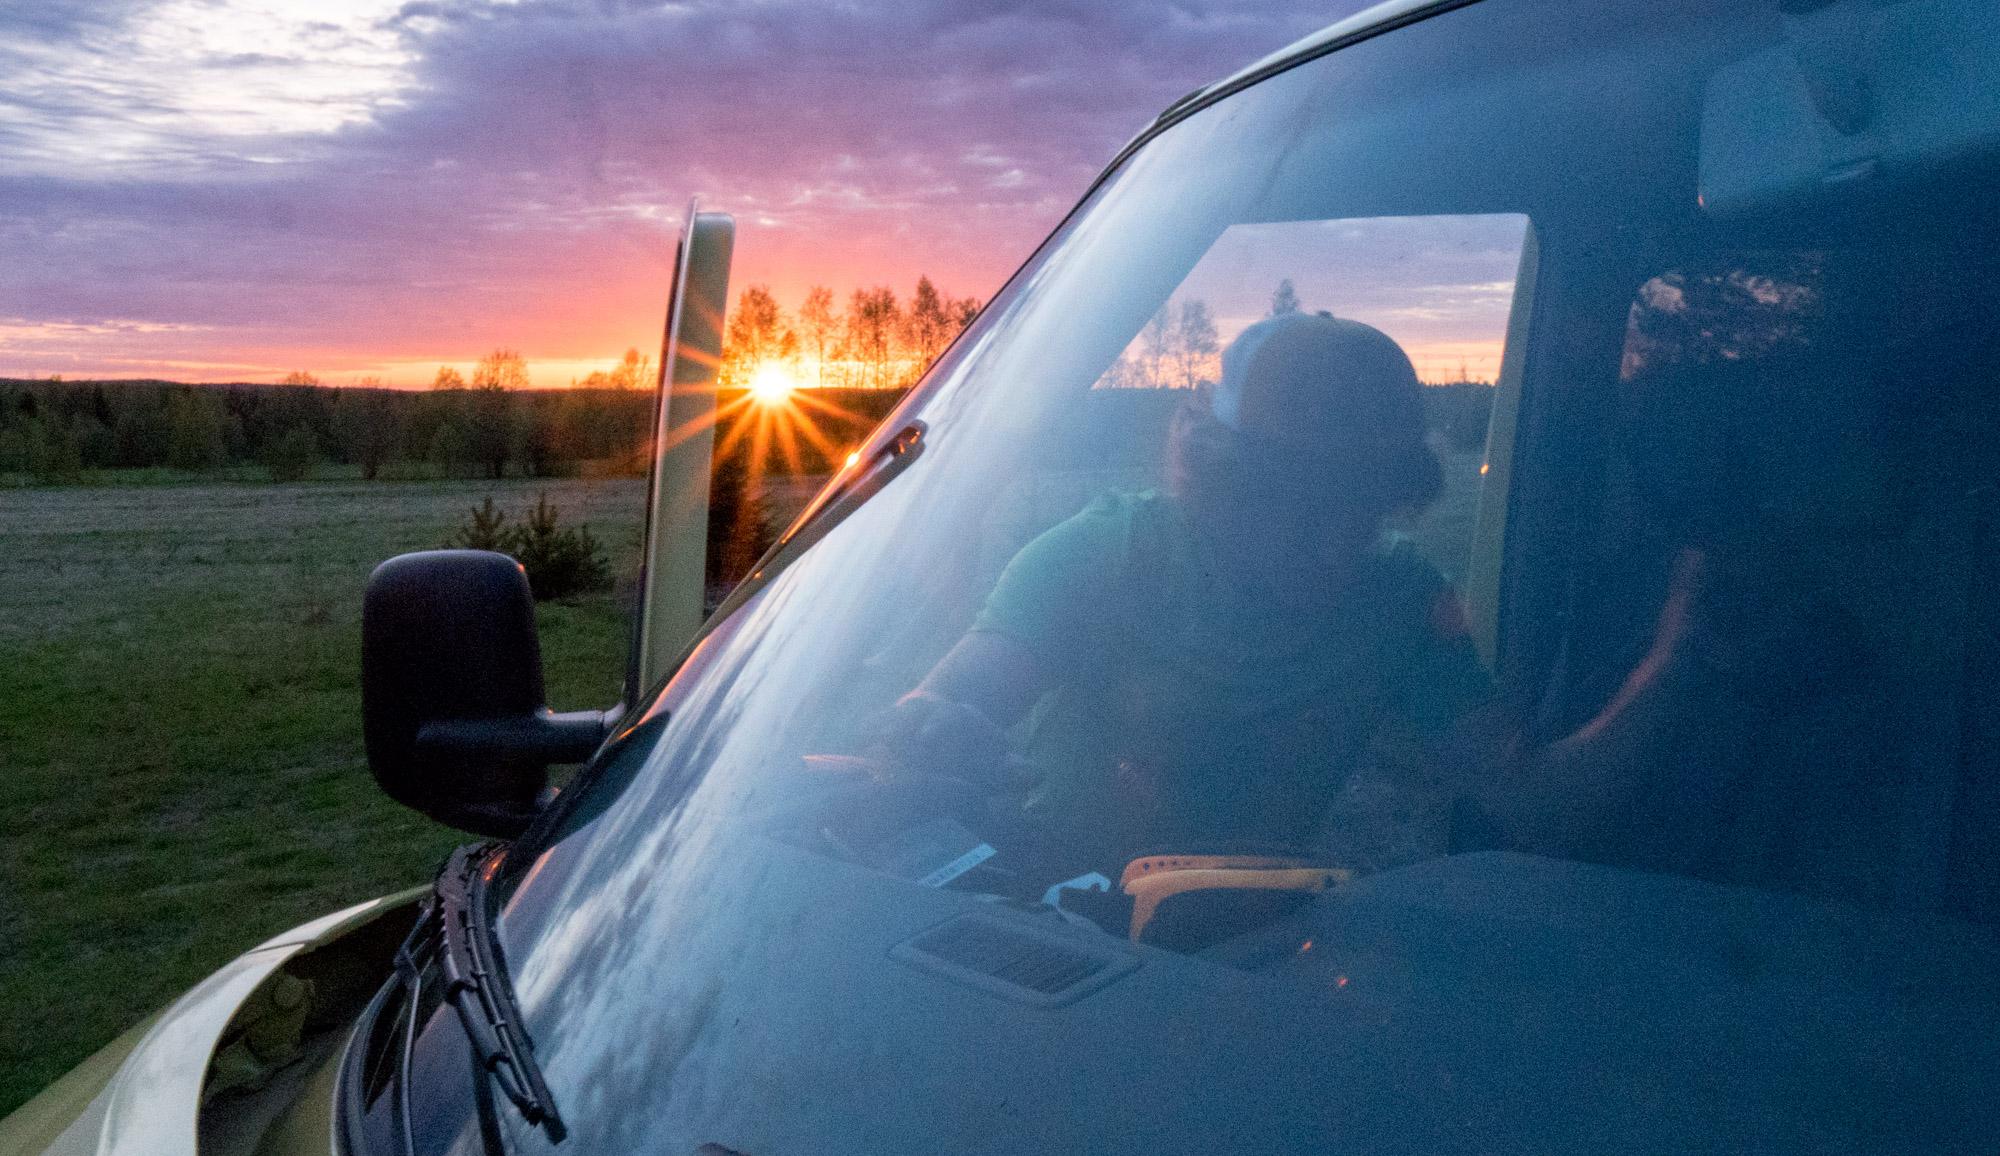 Martin sunset